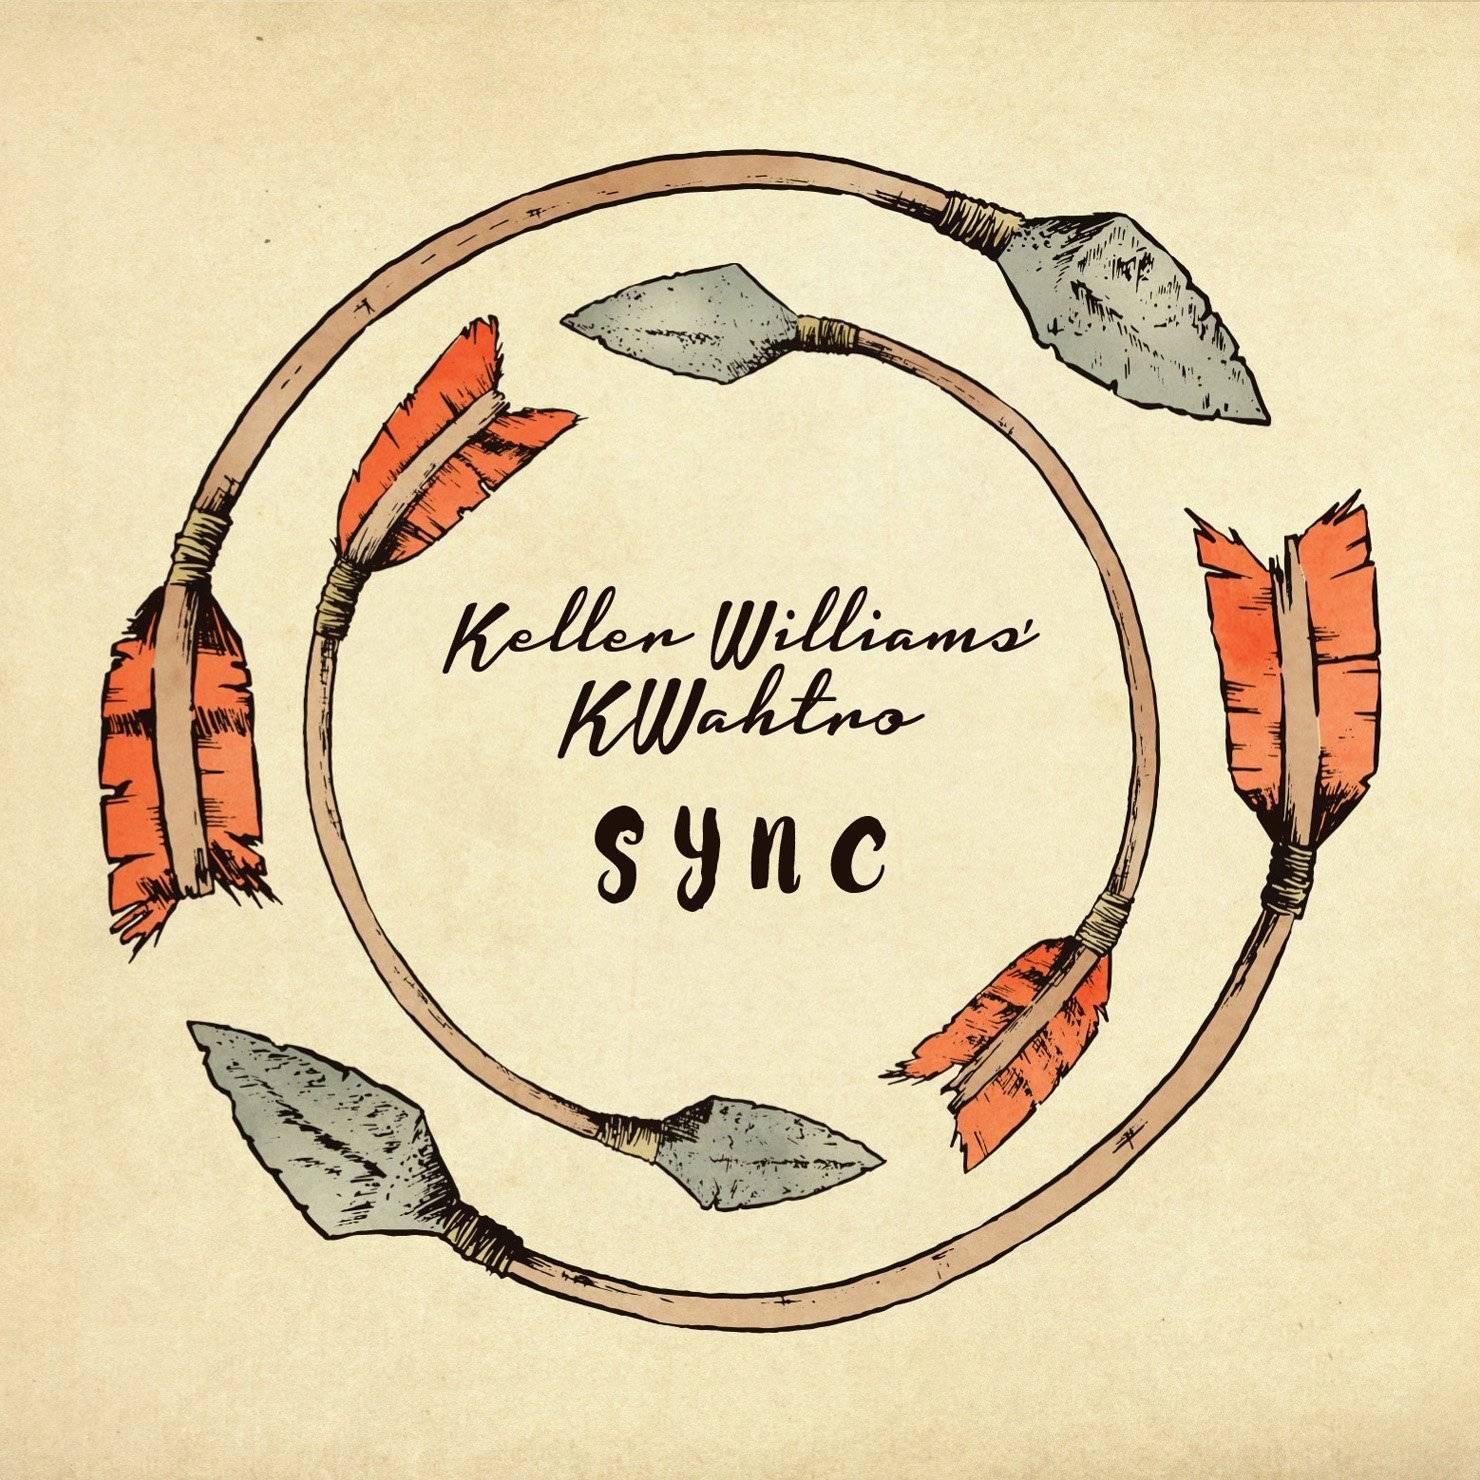 Keller Williams' Kwahtro - Sync (2017)